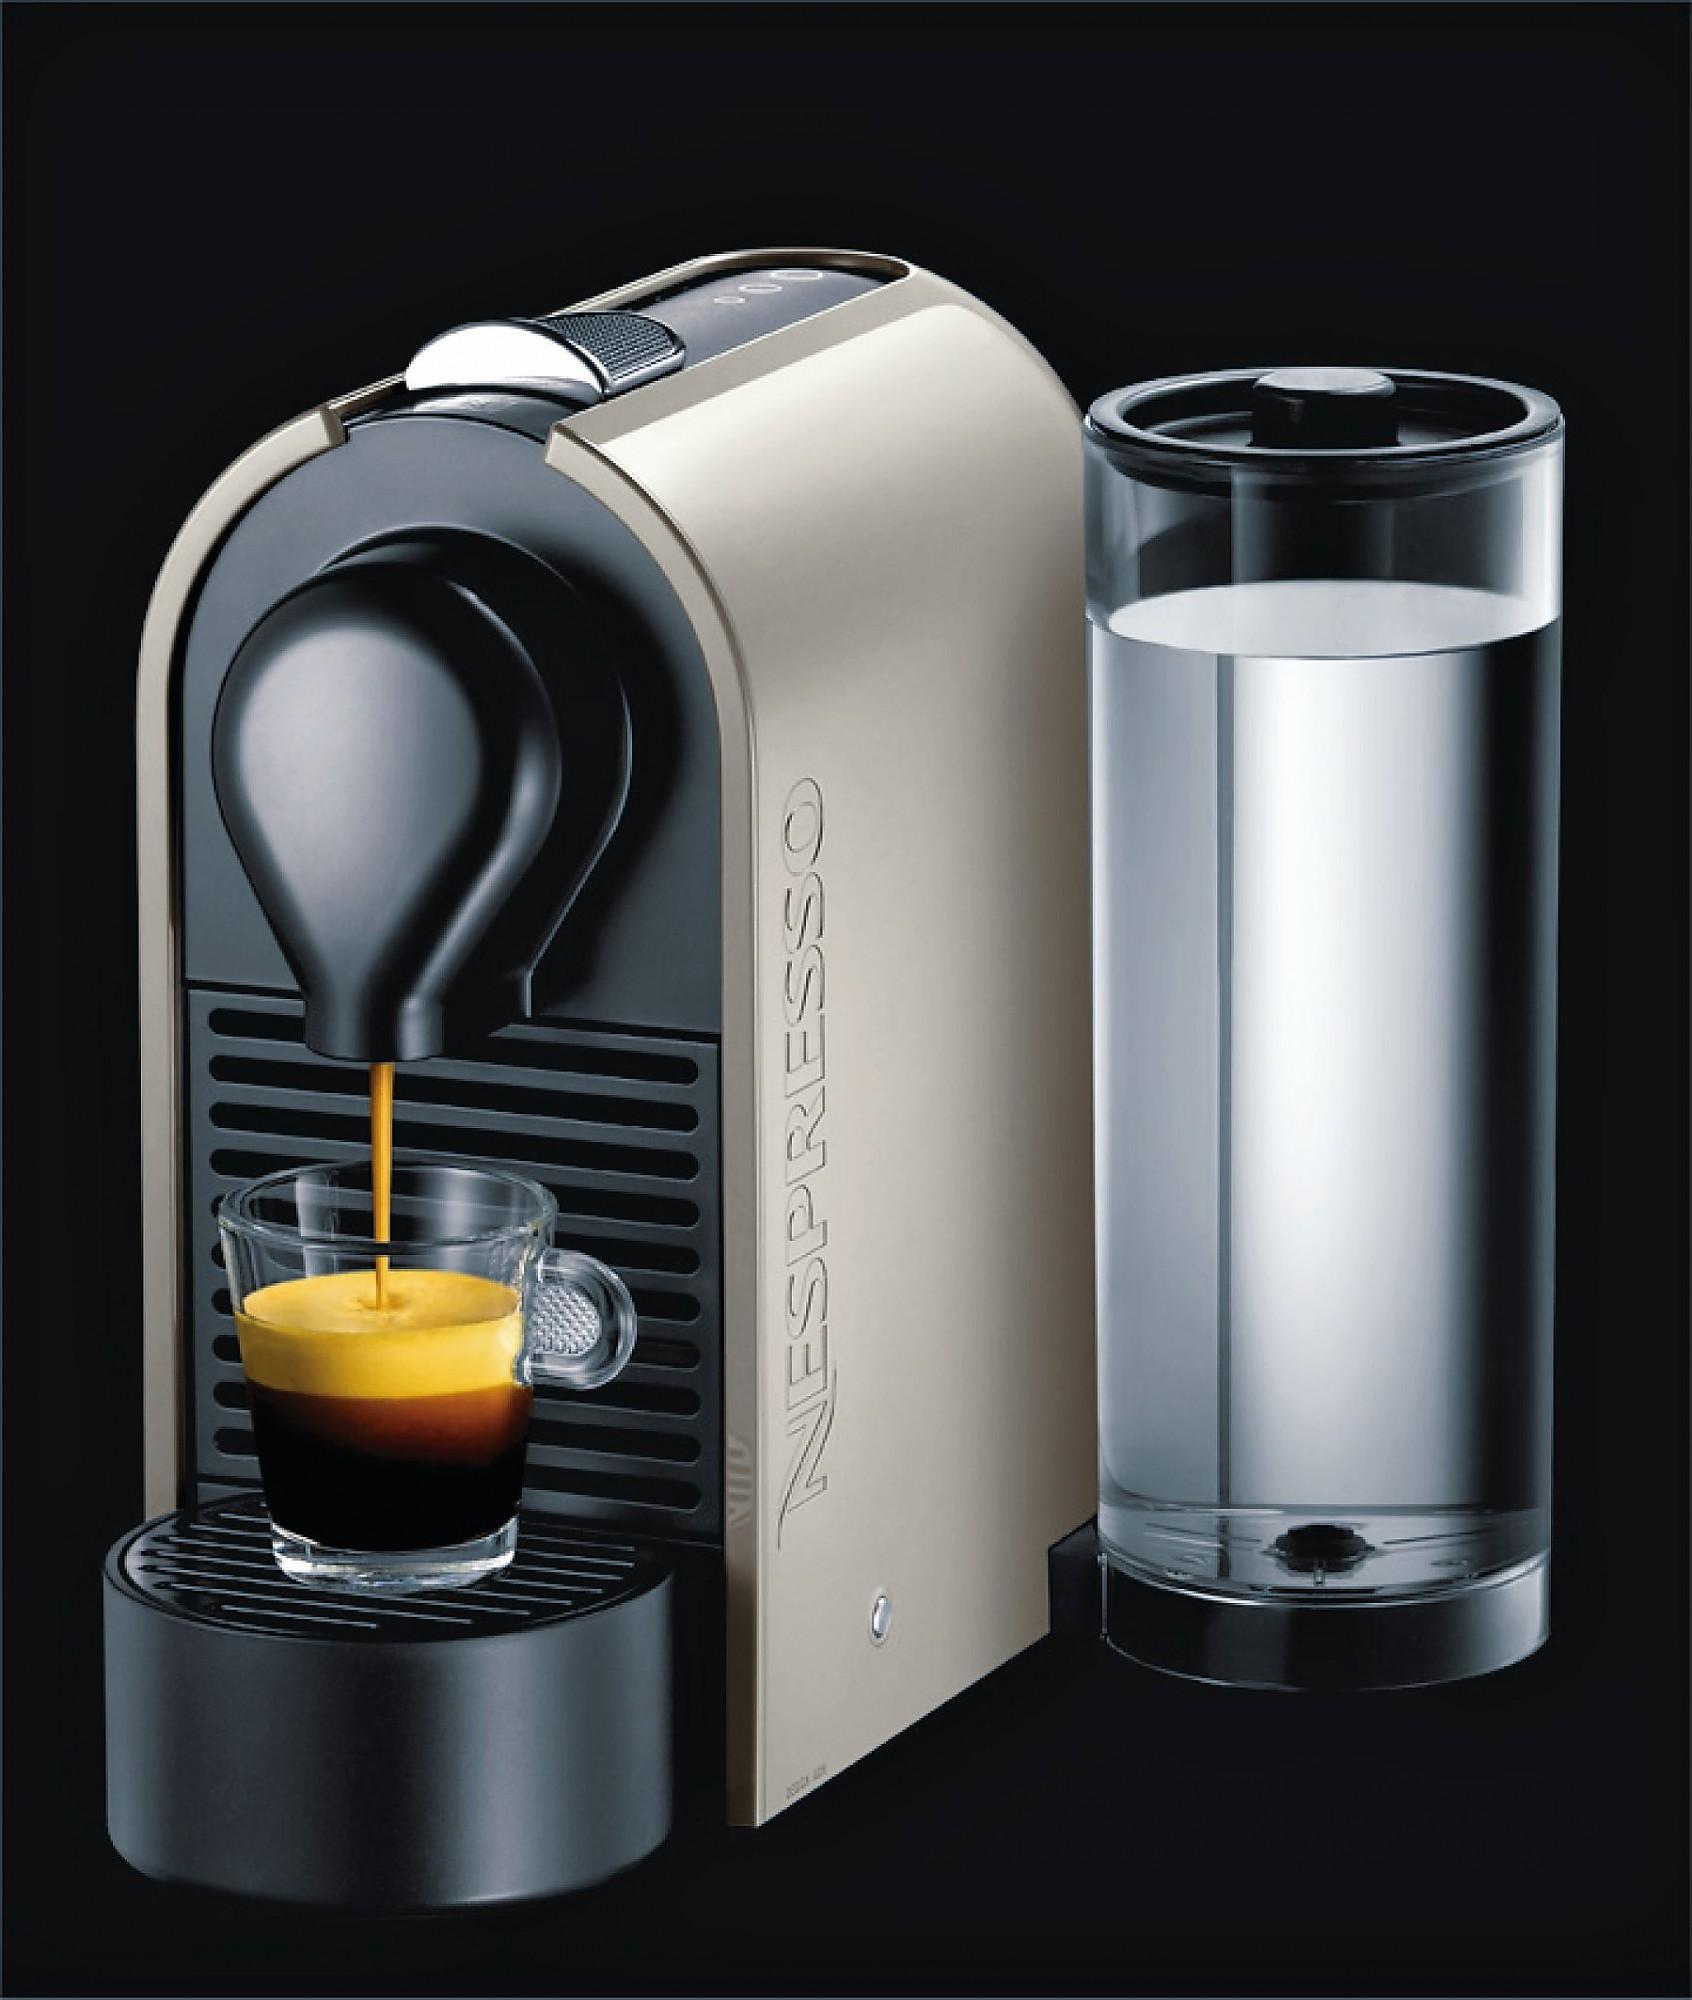 teamsix xn250a u grau schwarz krups macchine nespresso. Black Bedroom Furniture Sets. Home Design Ideas